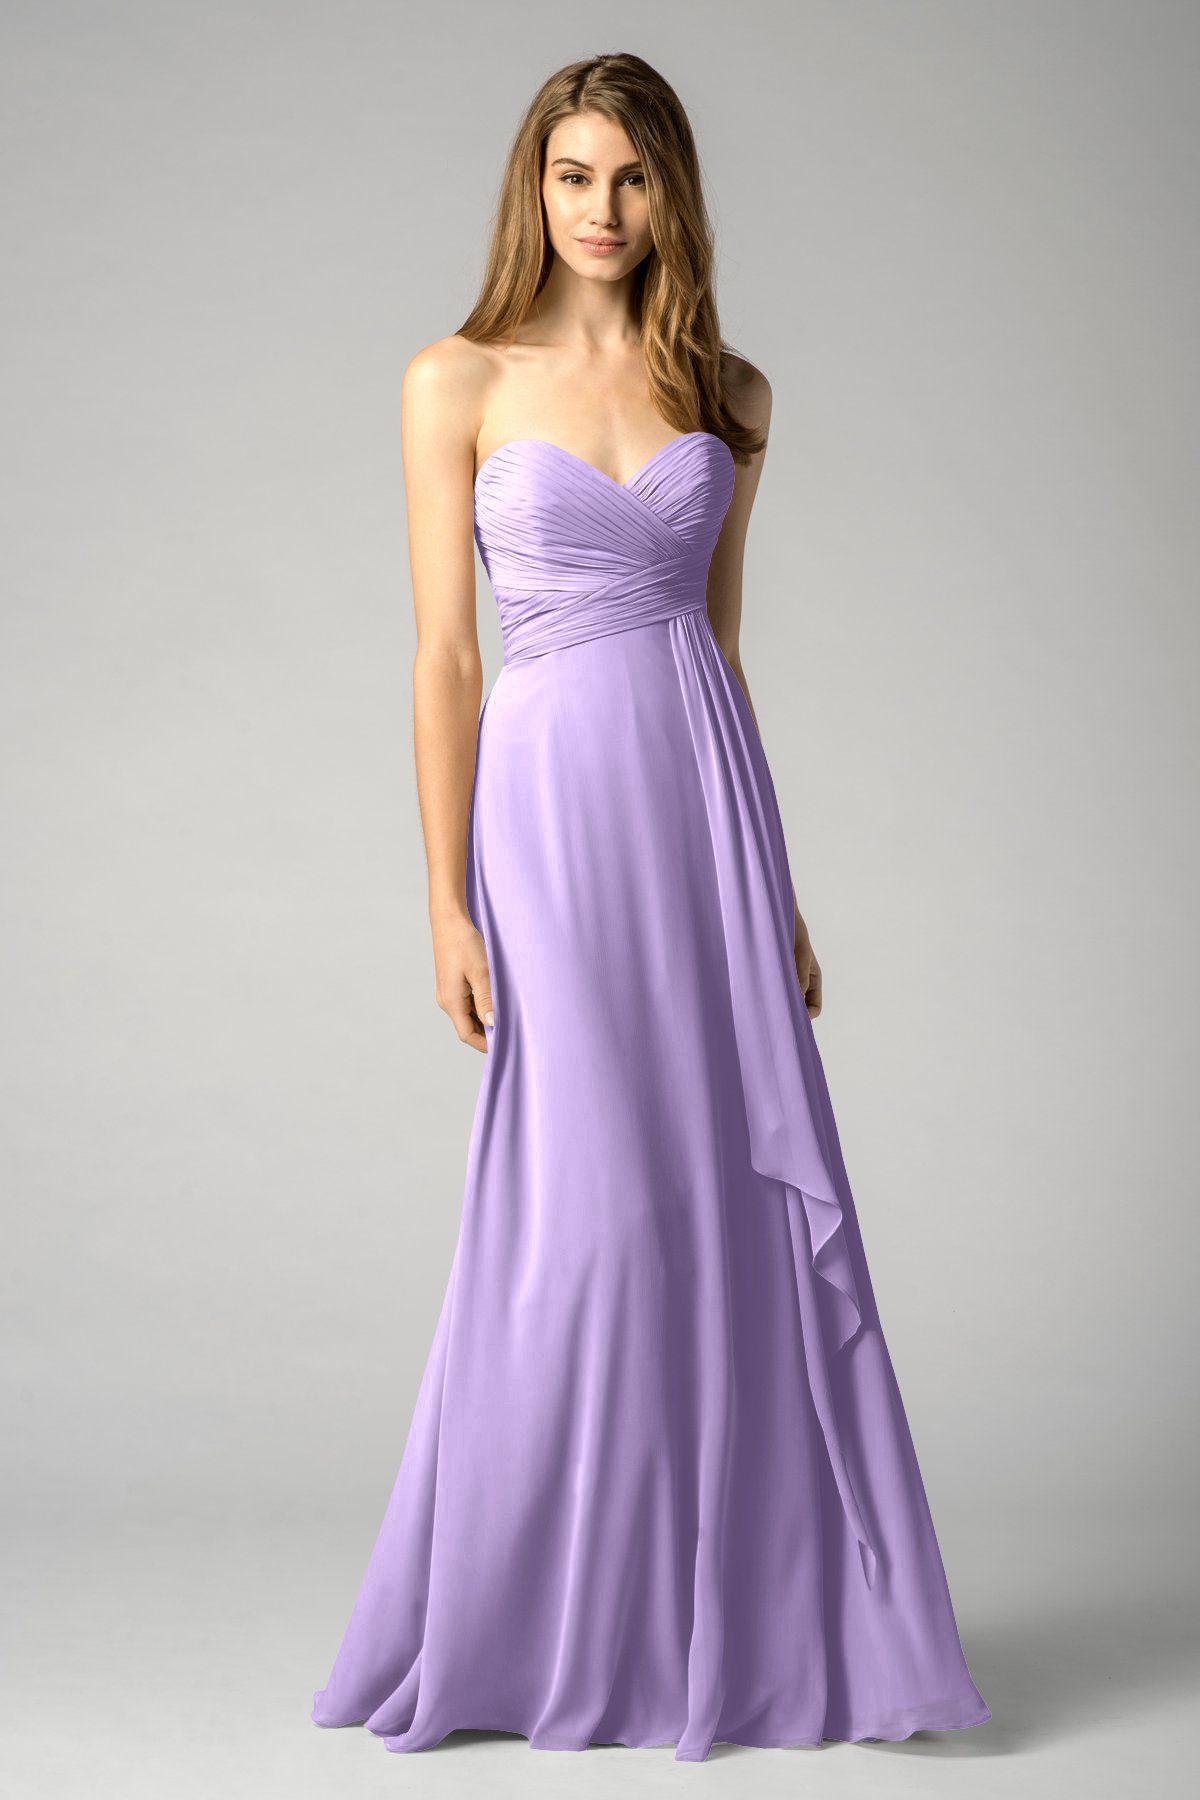 Watters Maids Dress Bryna | Wedding- June 4, 2016 | Pinterest